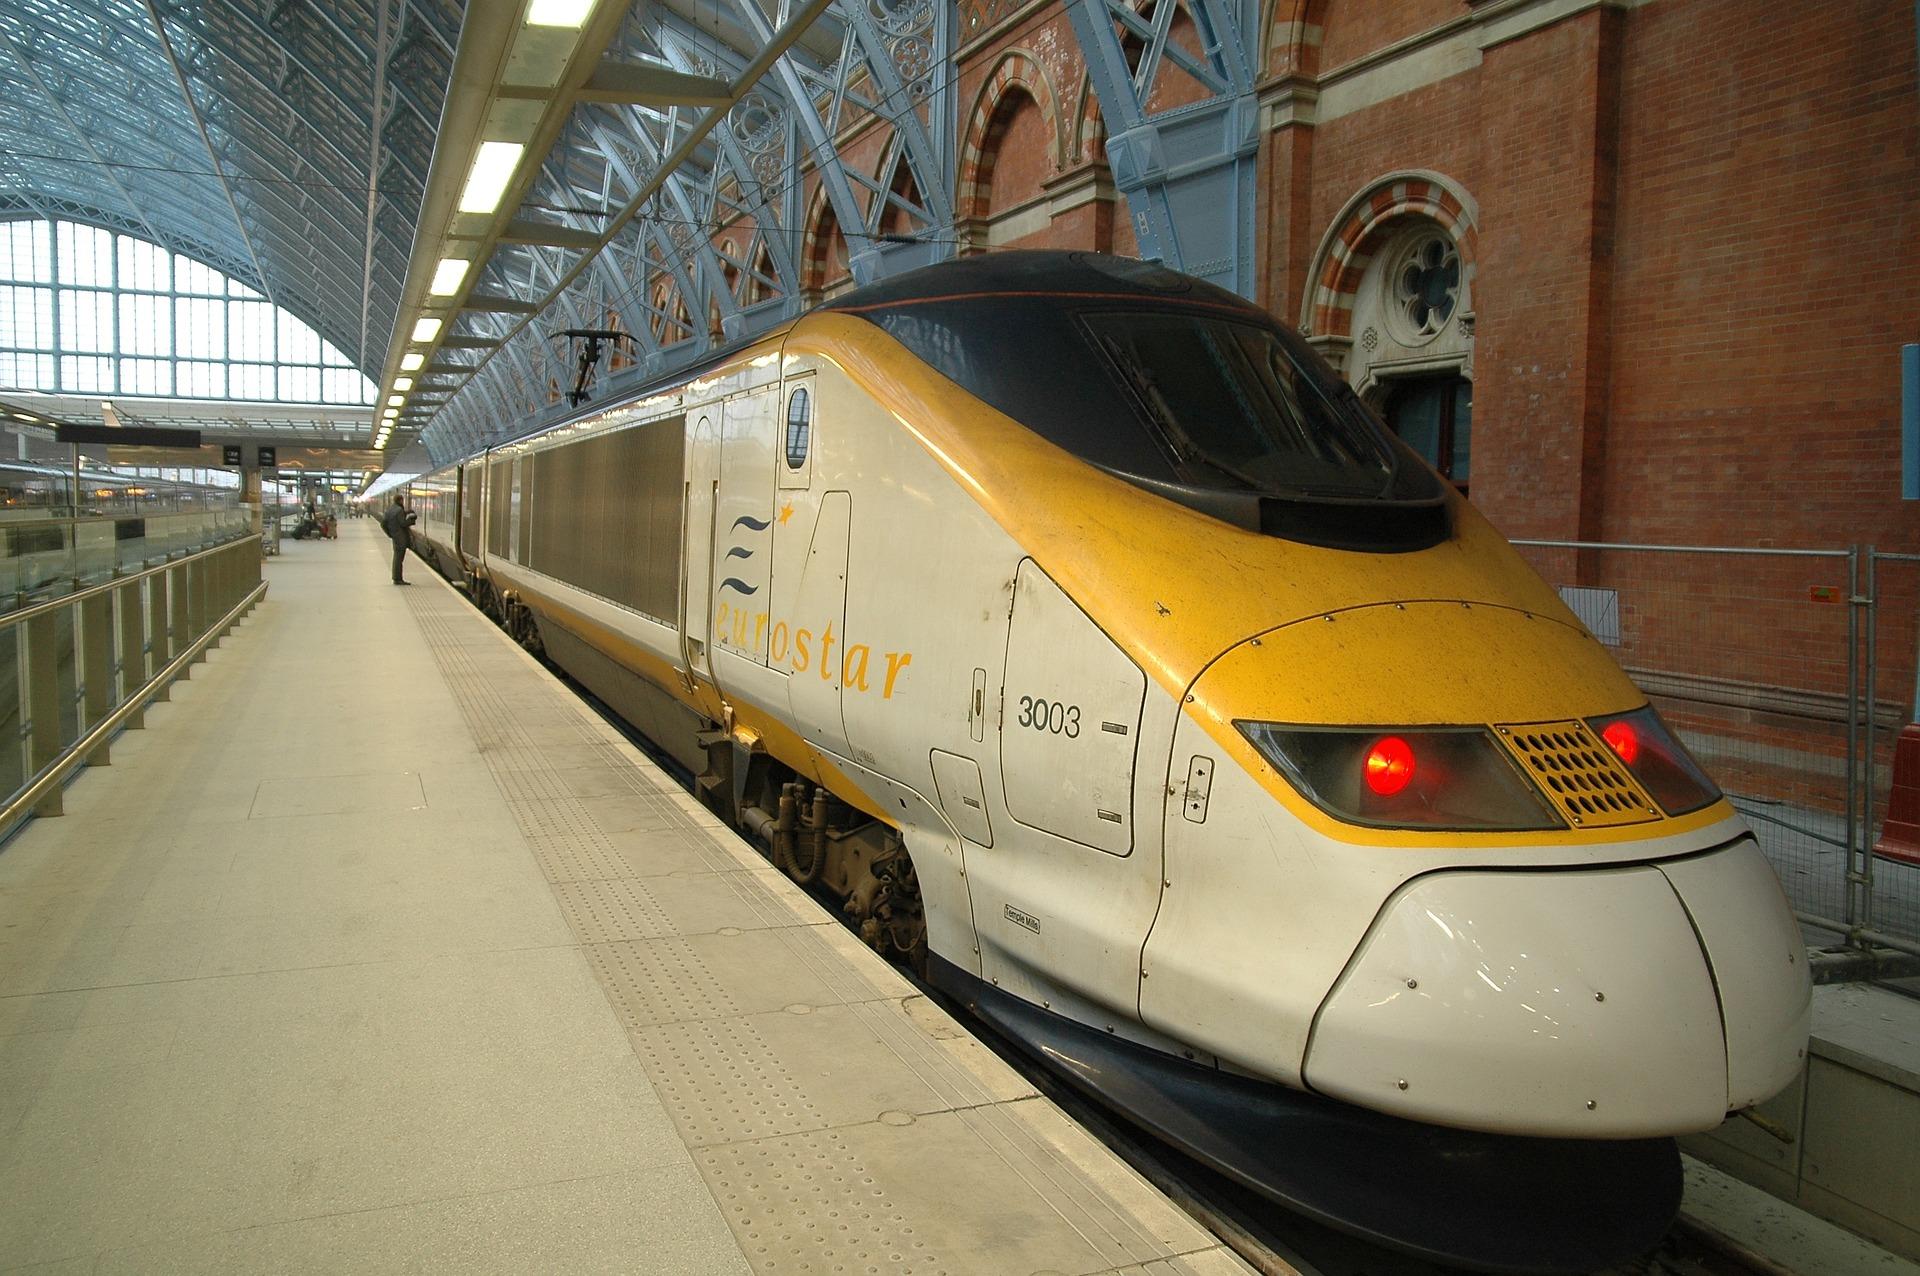 Eurostar en grève les 30 septembre et 1er octobre prochains